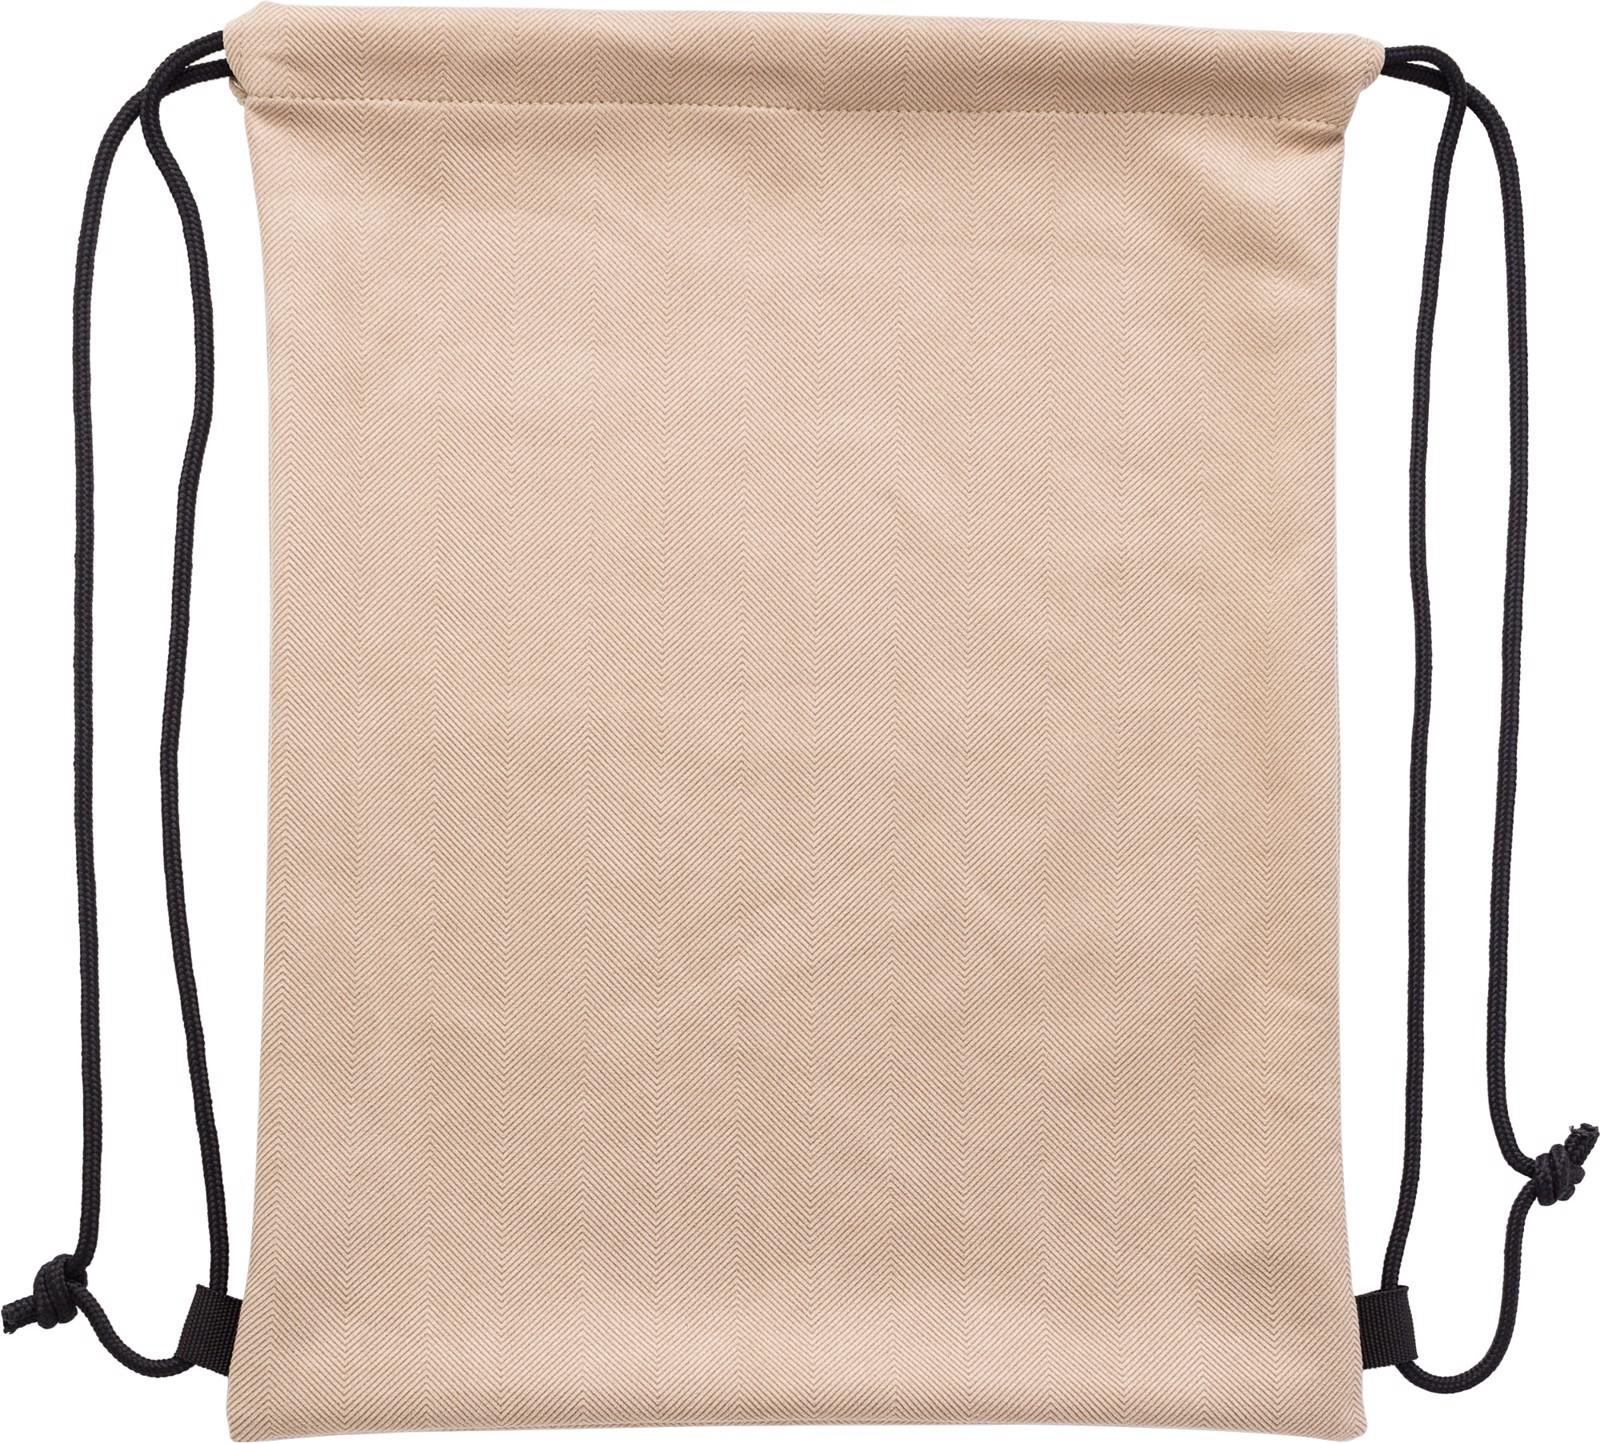 Polyester (210D) drawstring backpack - Khaki